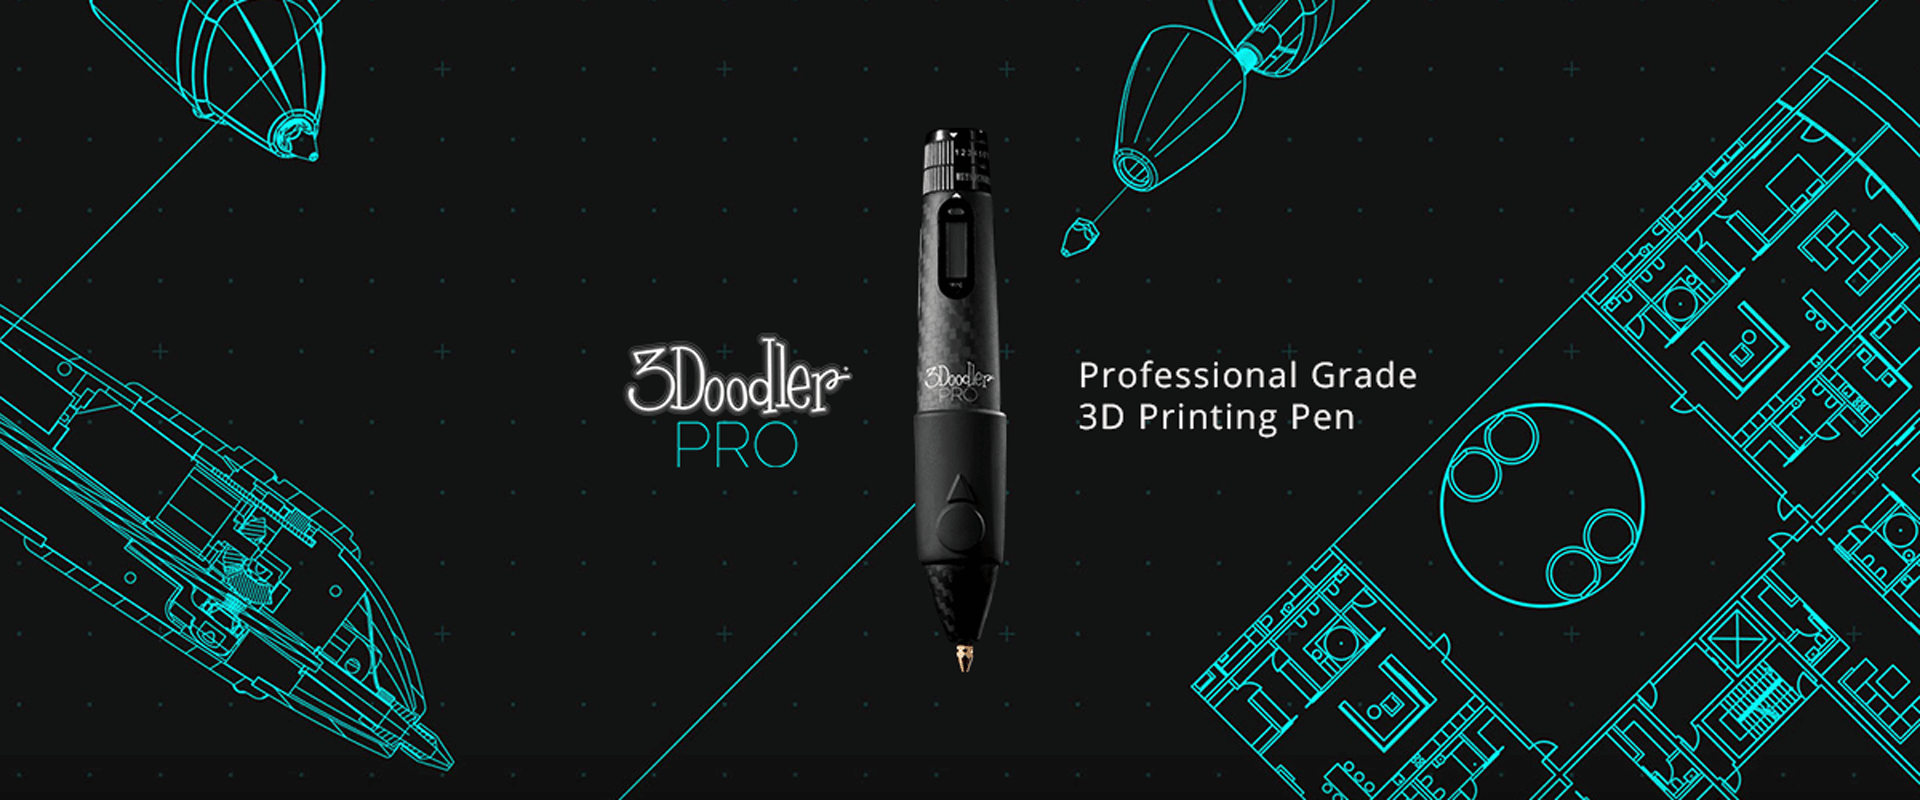 3Doodler Pro - 3D Printing Pen